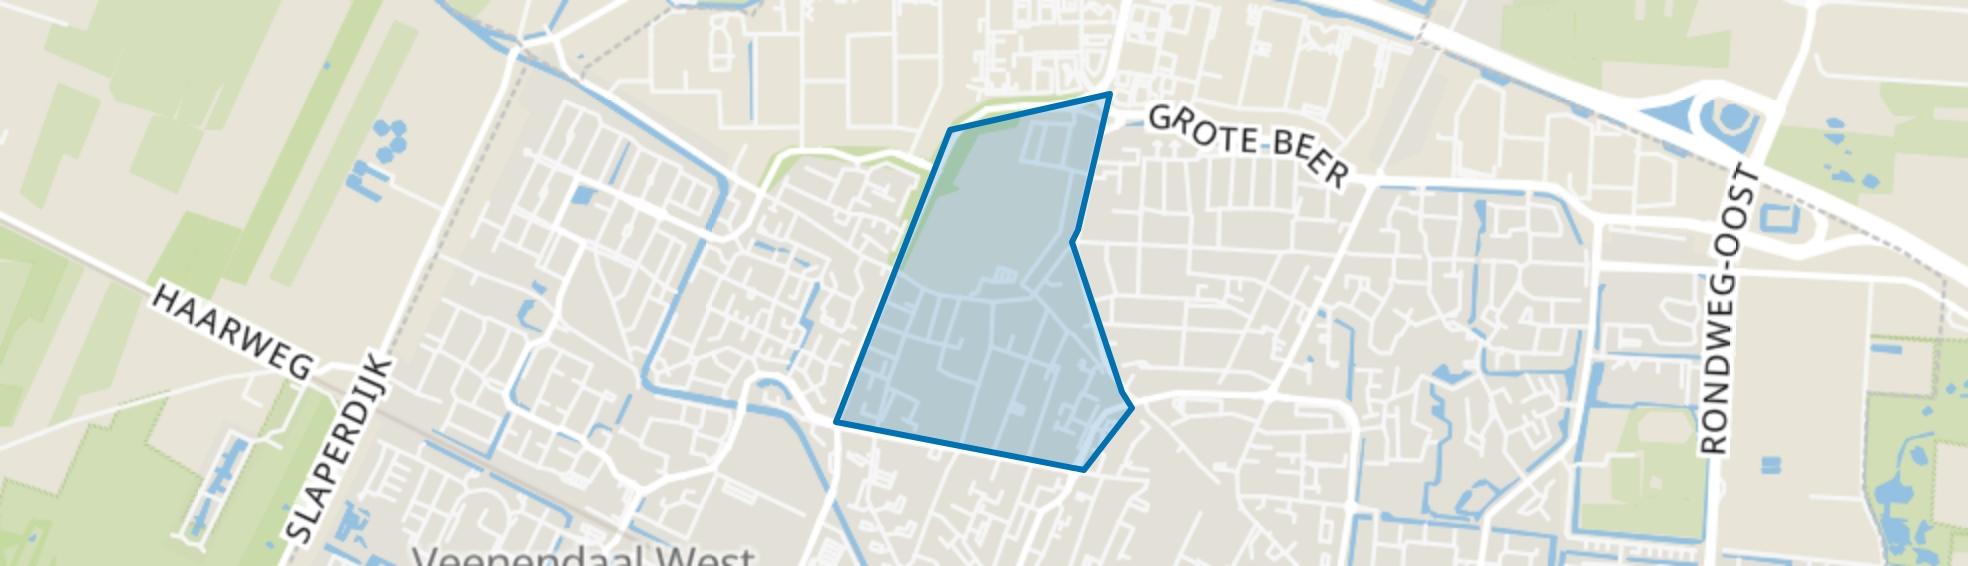 't Hoorntje, Veenendaal map